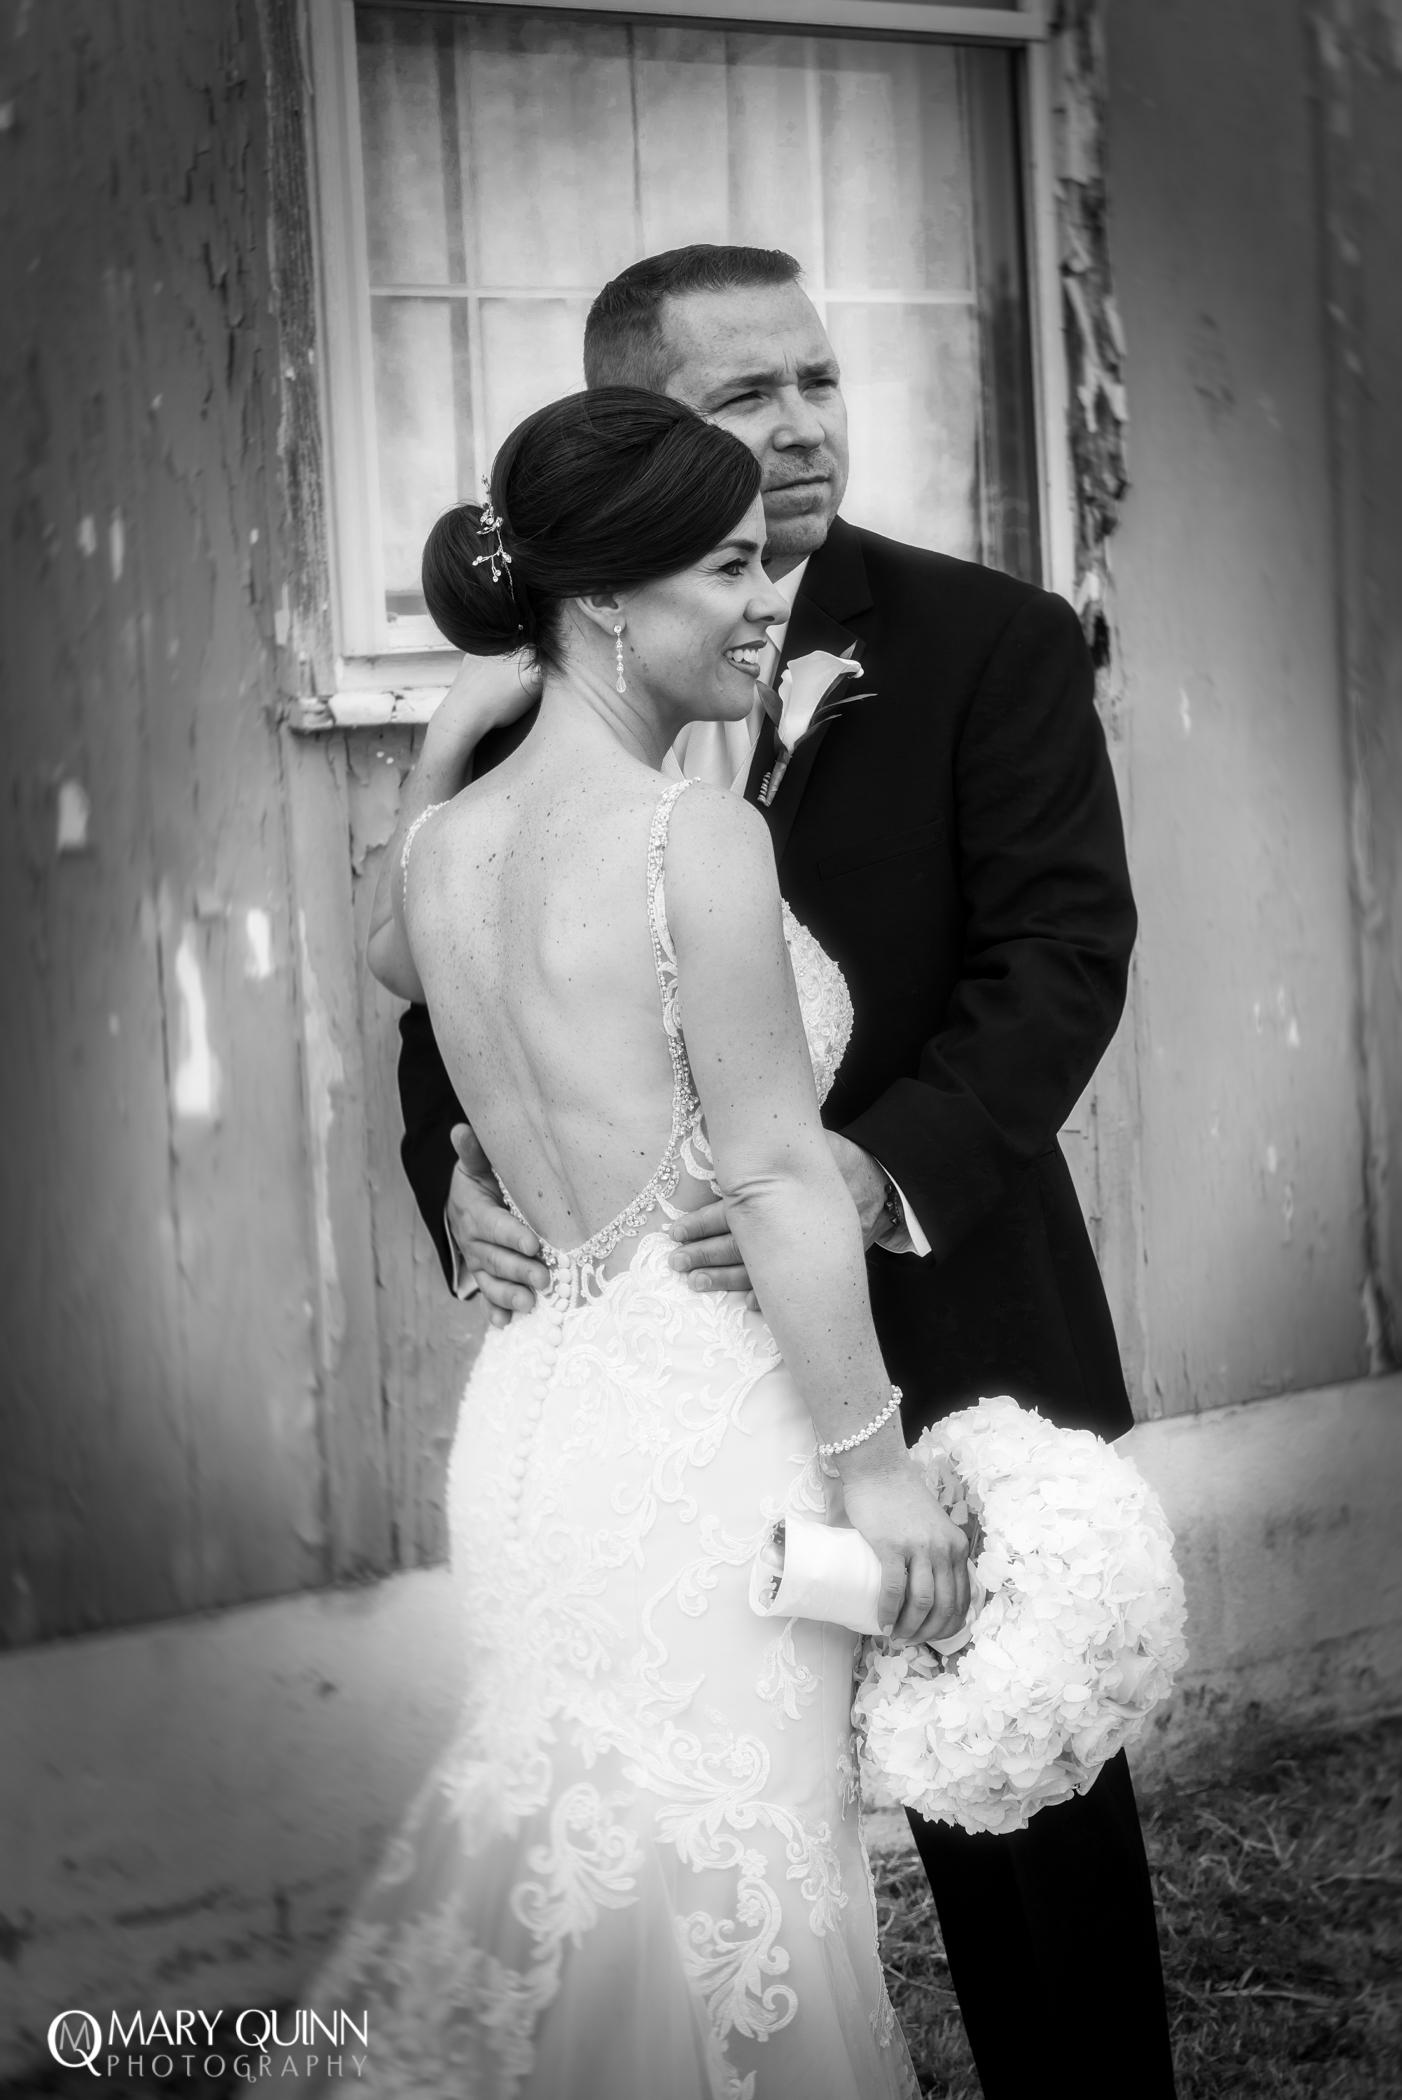 Gh5 For Wedding Photography: Indian Spring Country Club Marlton, NJ Wedding